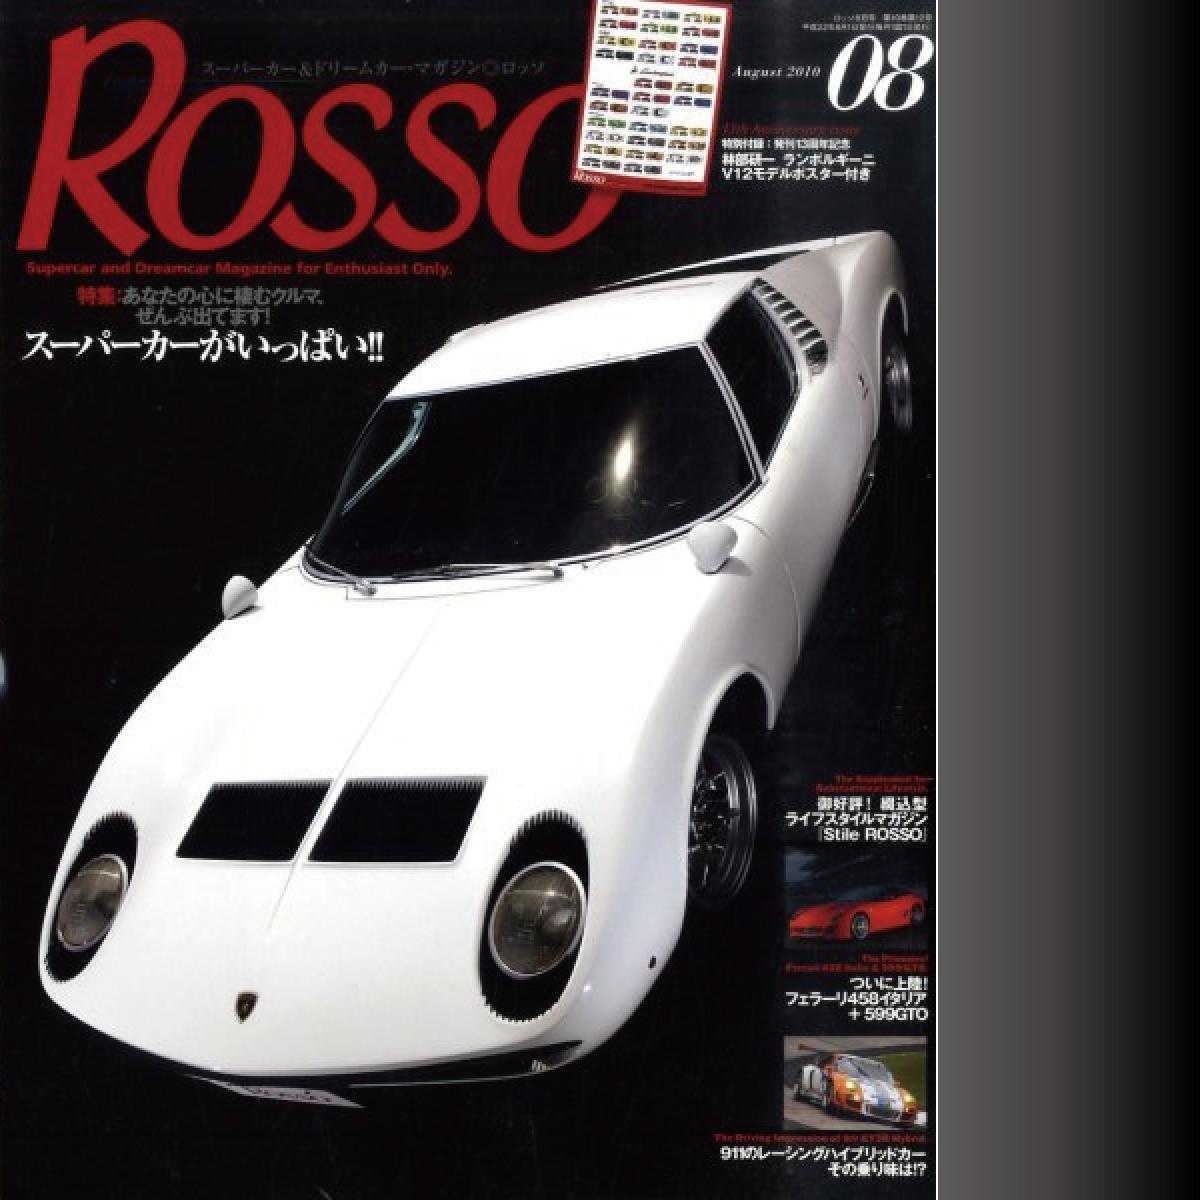 CLEFS毛ばたき + ROSSO 2010年8月号